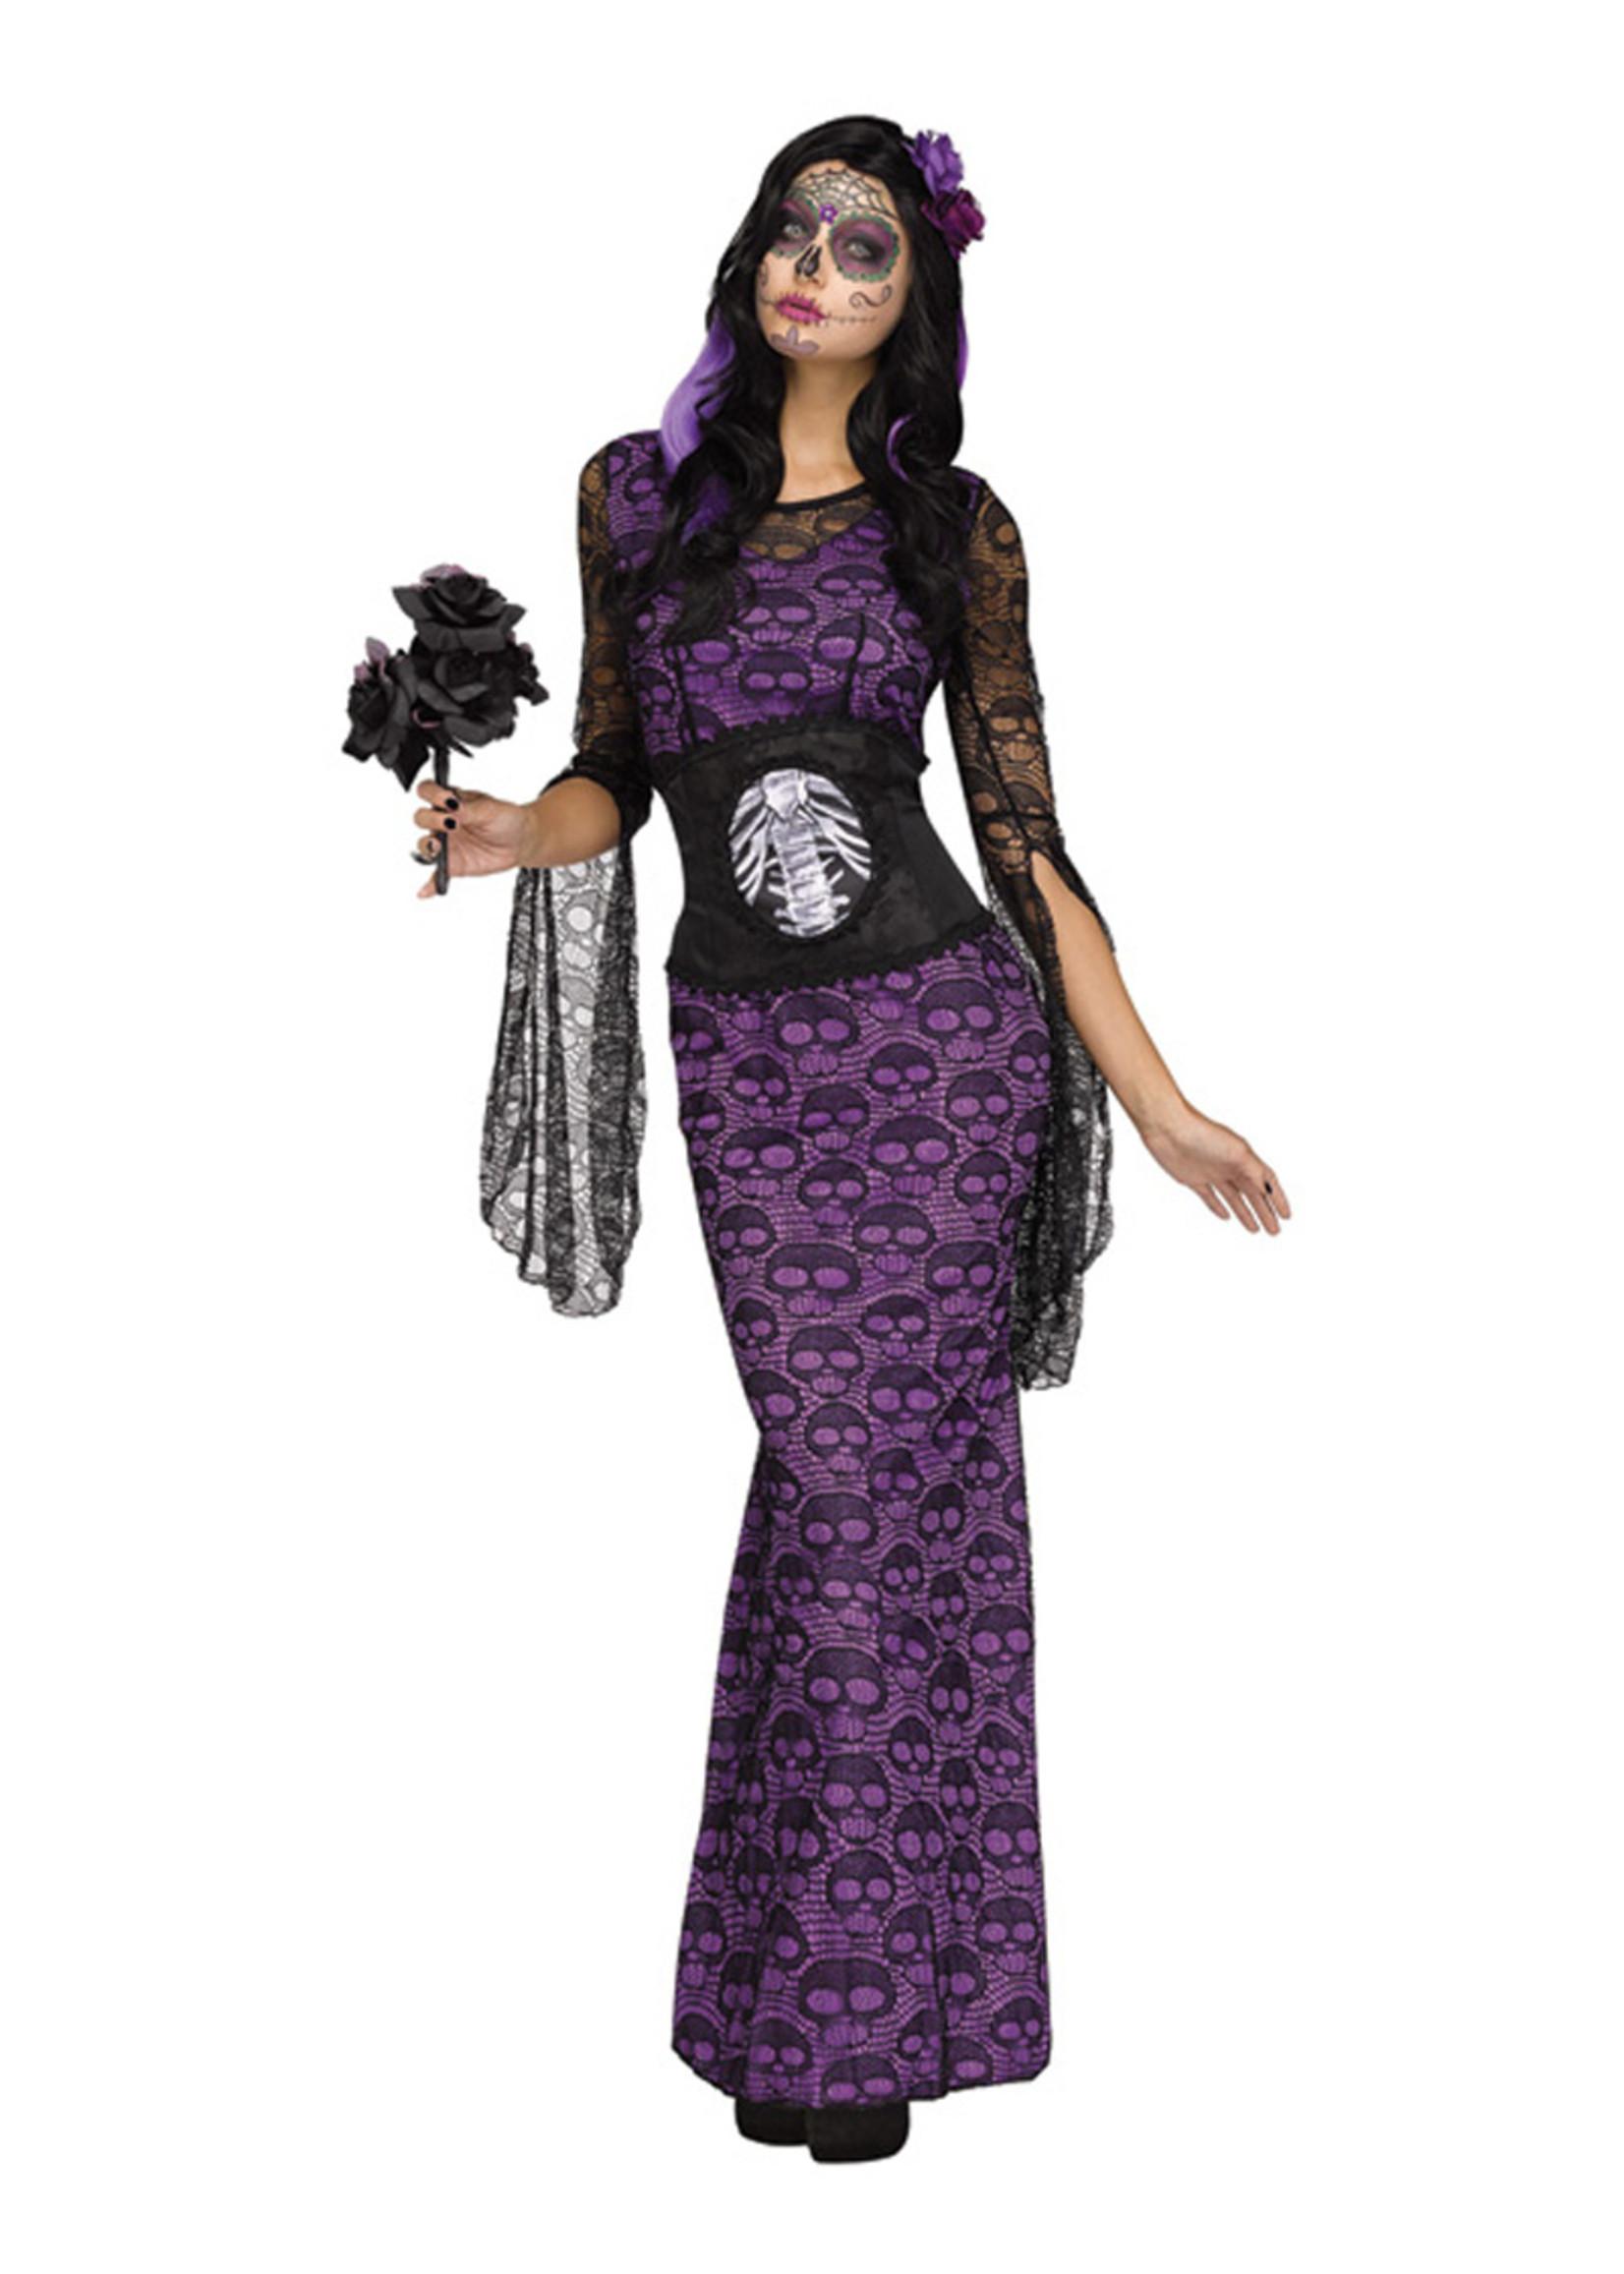 La Muerte Costume - Women's